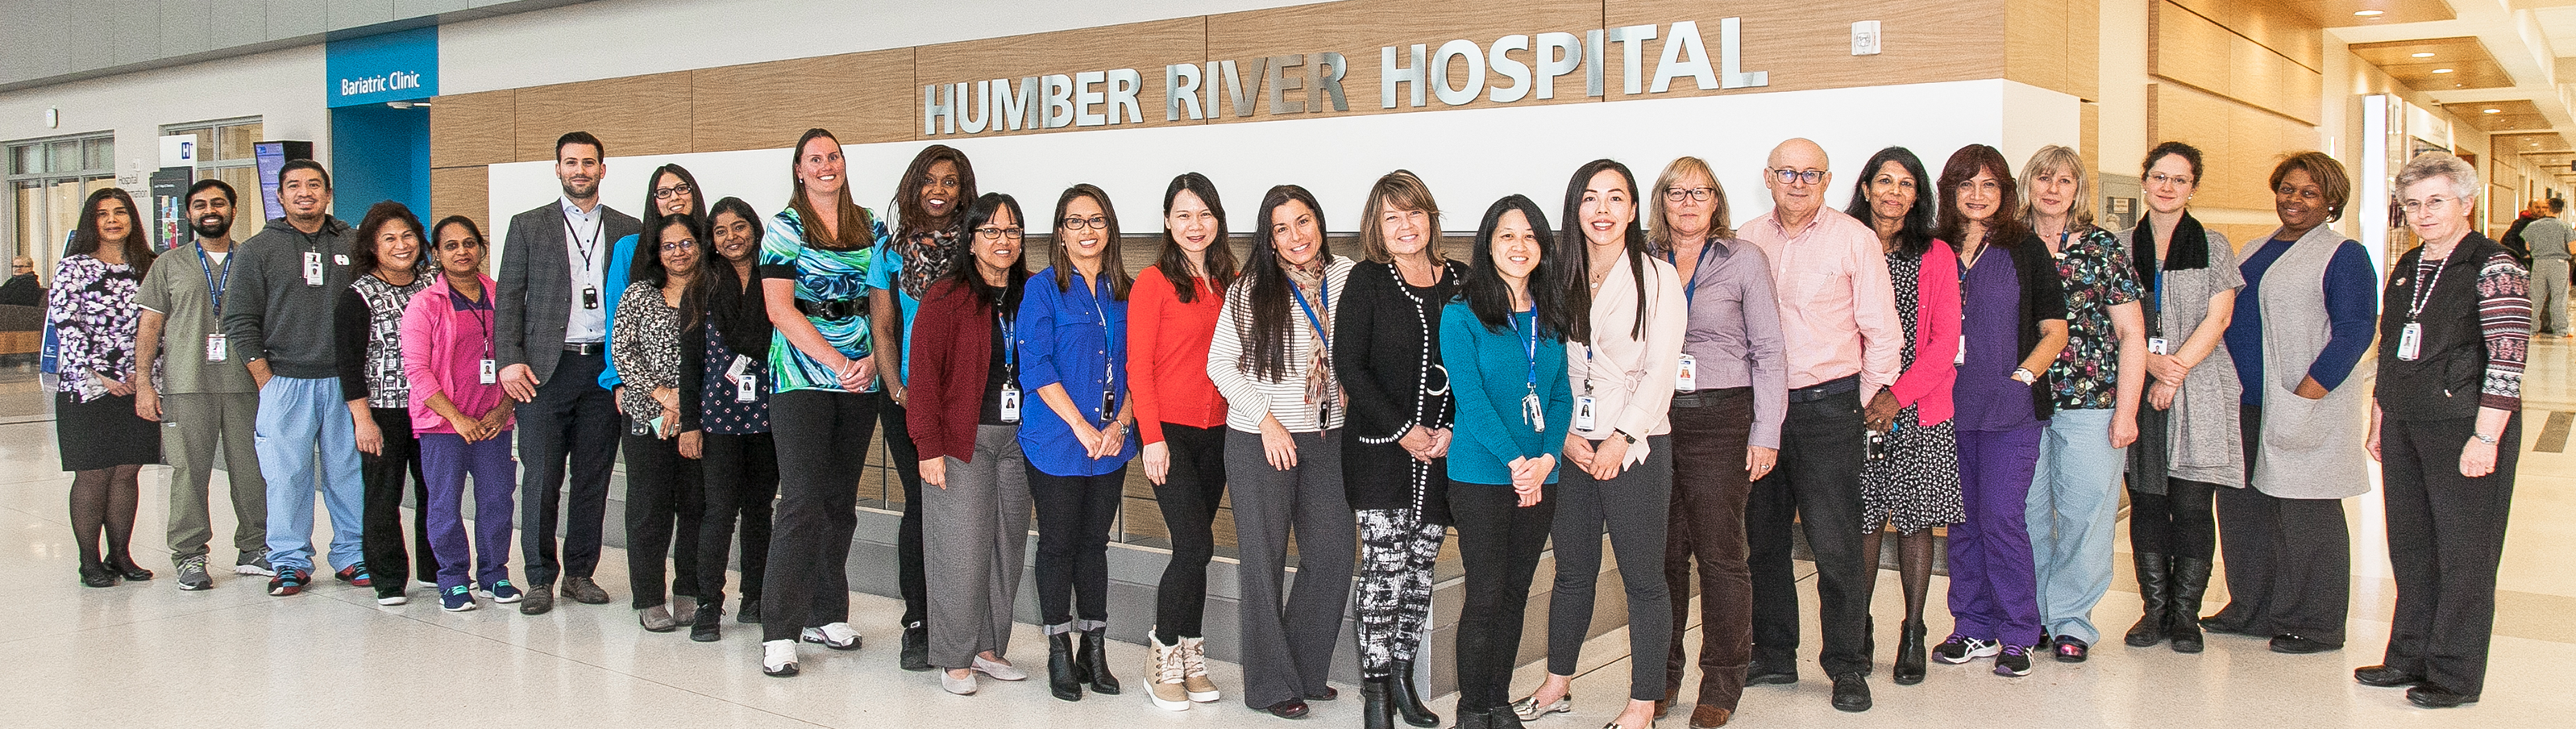 Kidney Care - Humber River Hospital